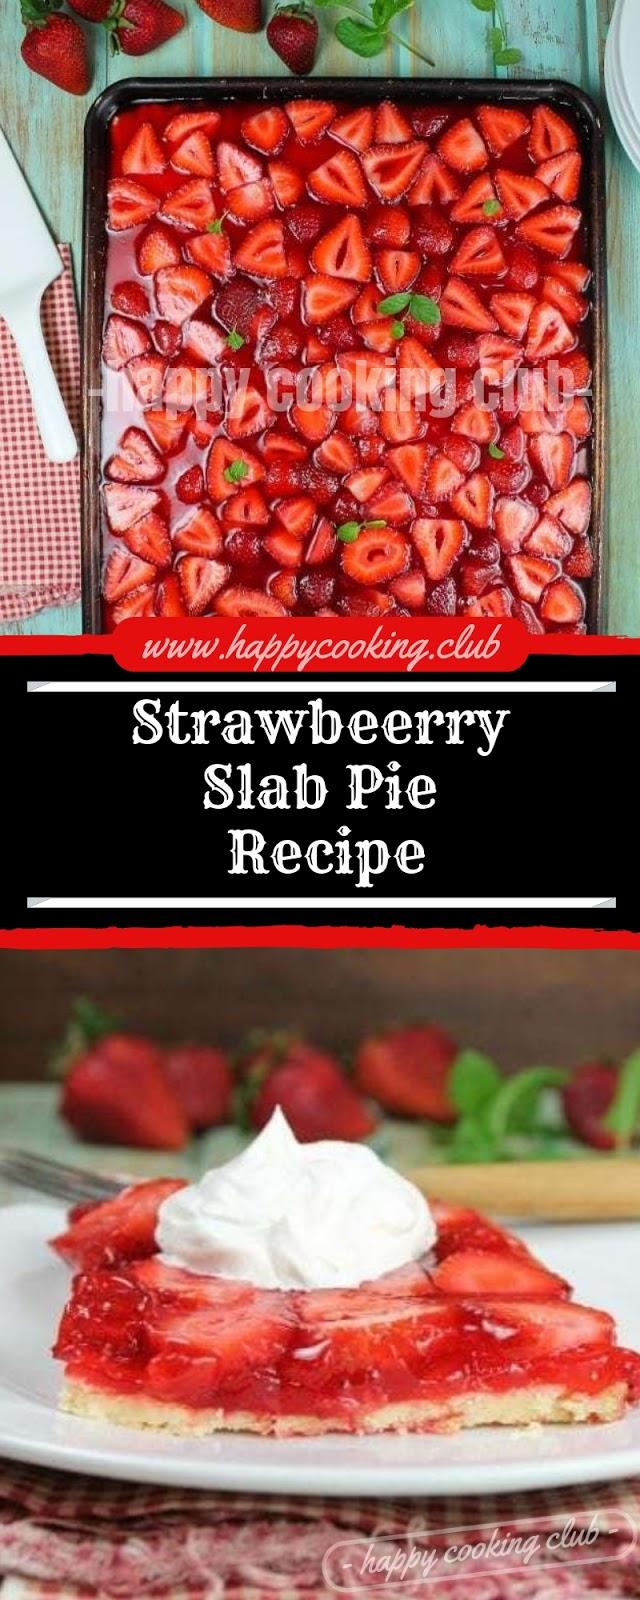 Strawbeerry Slab Pie Recipe